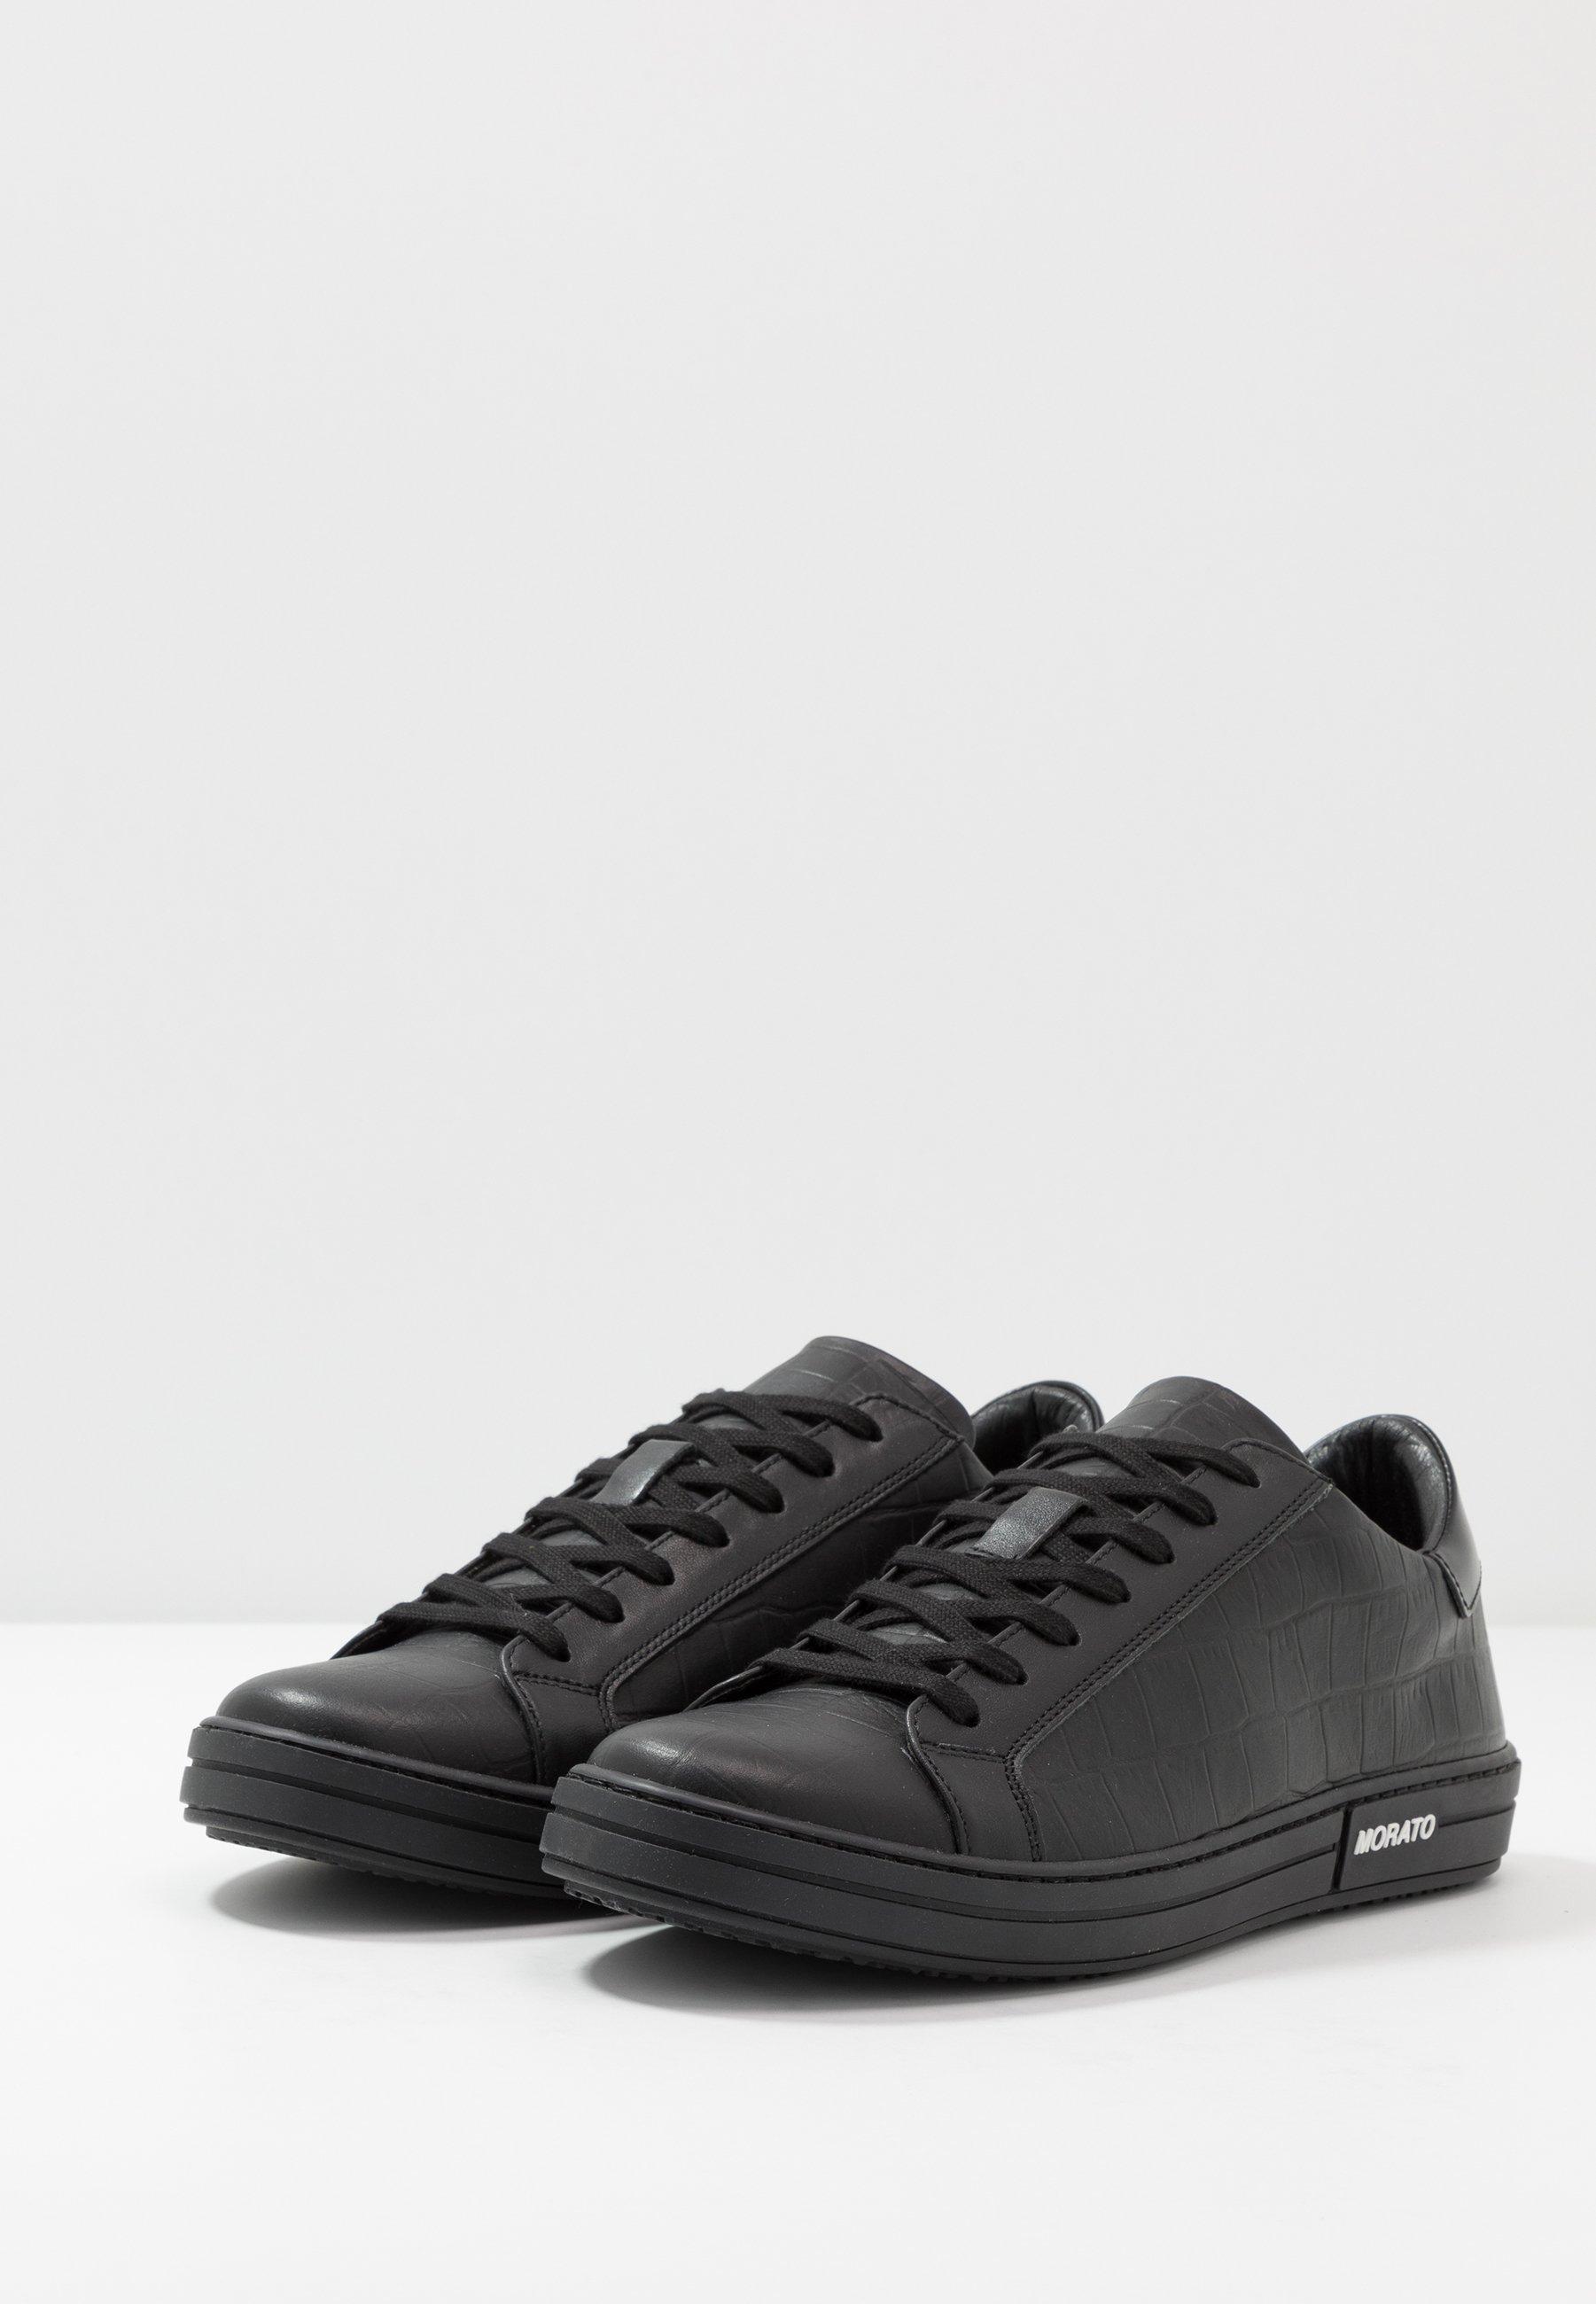 Antony Morato SCREEN - Sneaker low - black/schwarz - Herrenschuhe cw22e